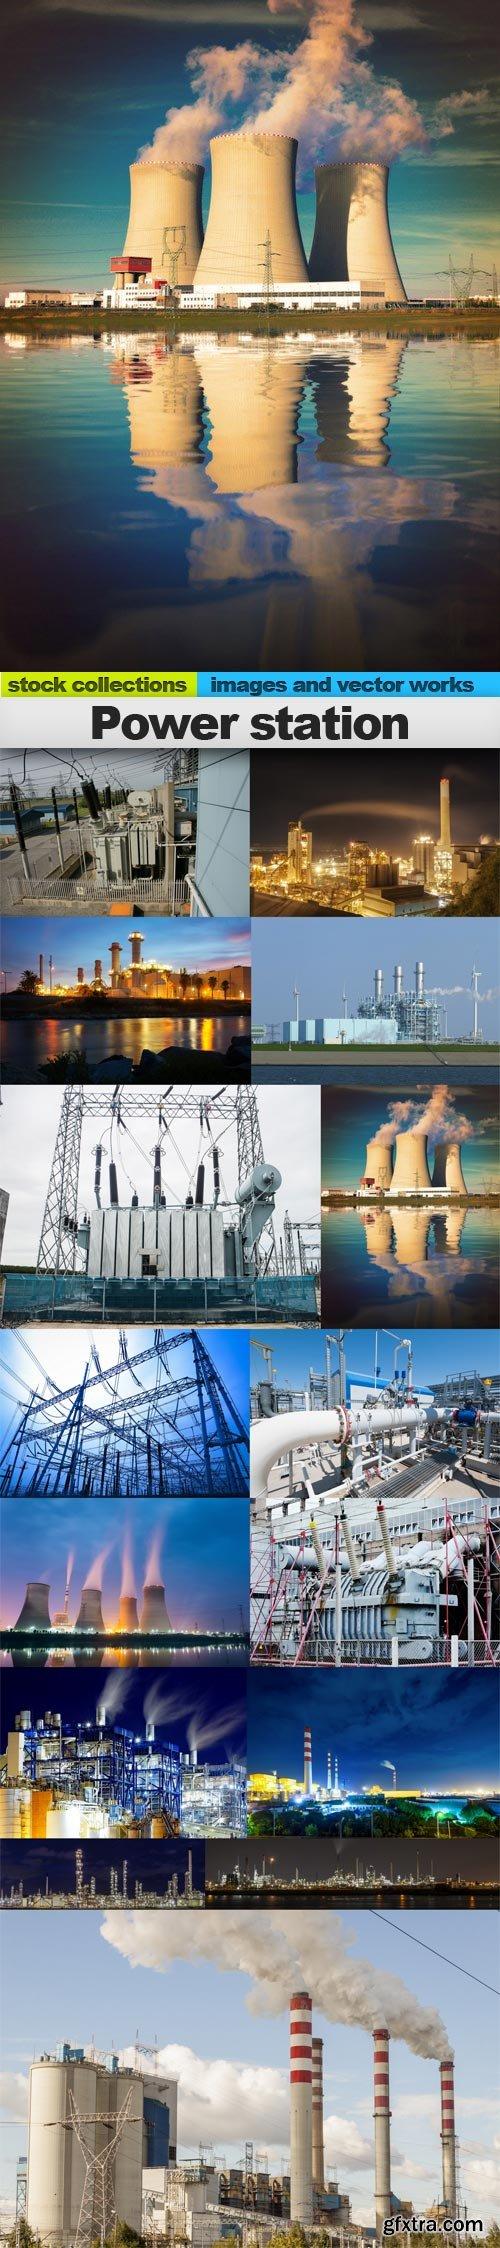 Power station, 15 x UHQ JPEG